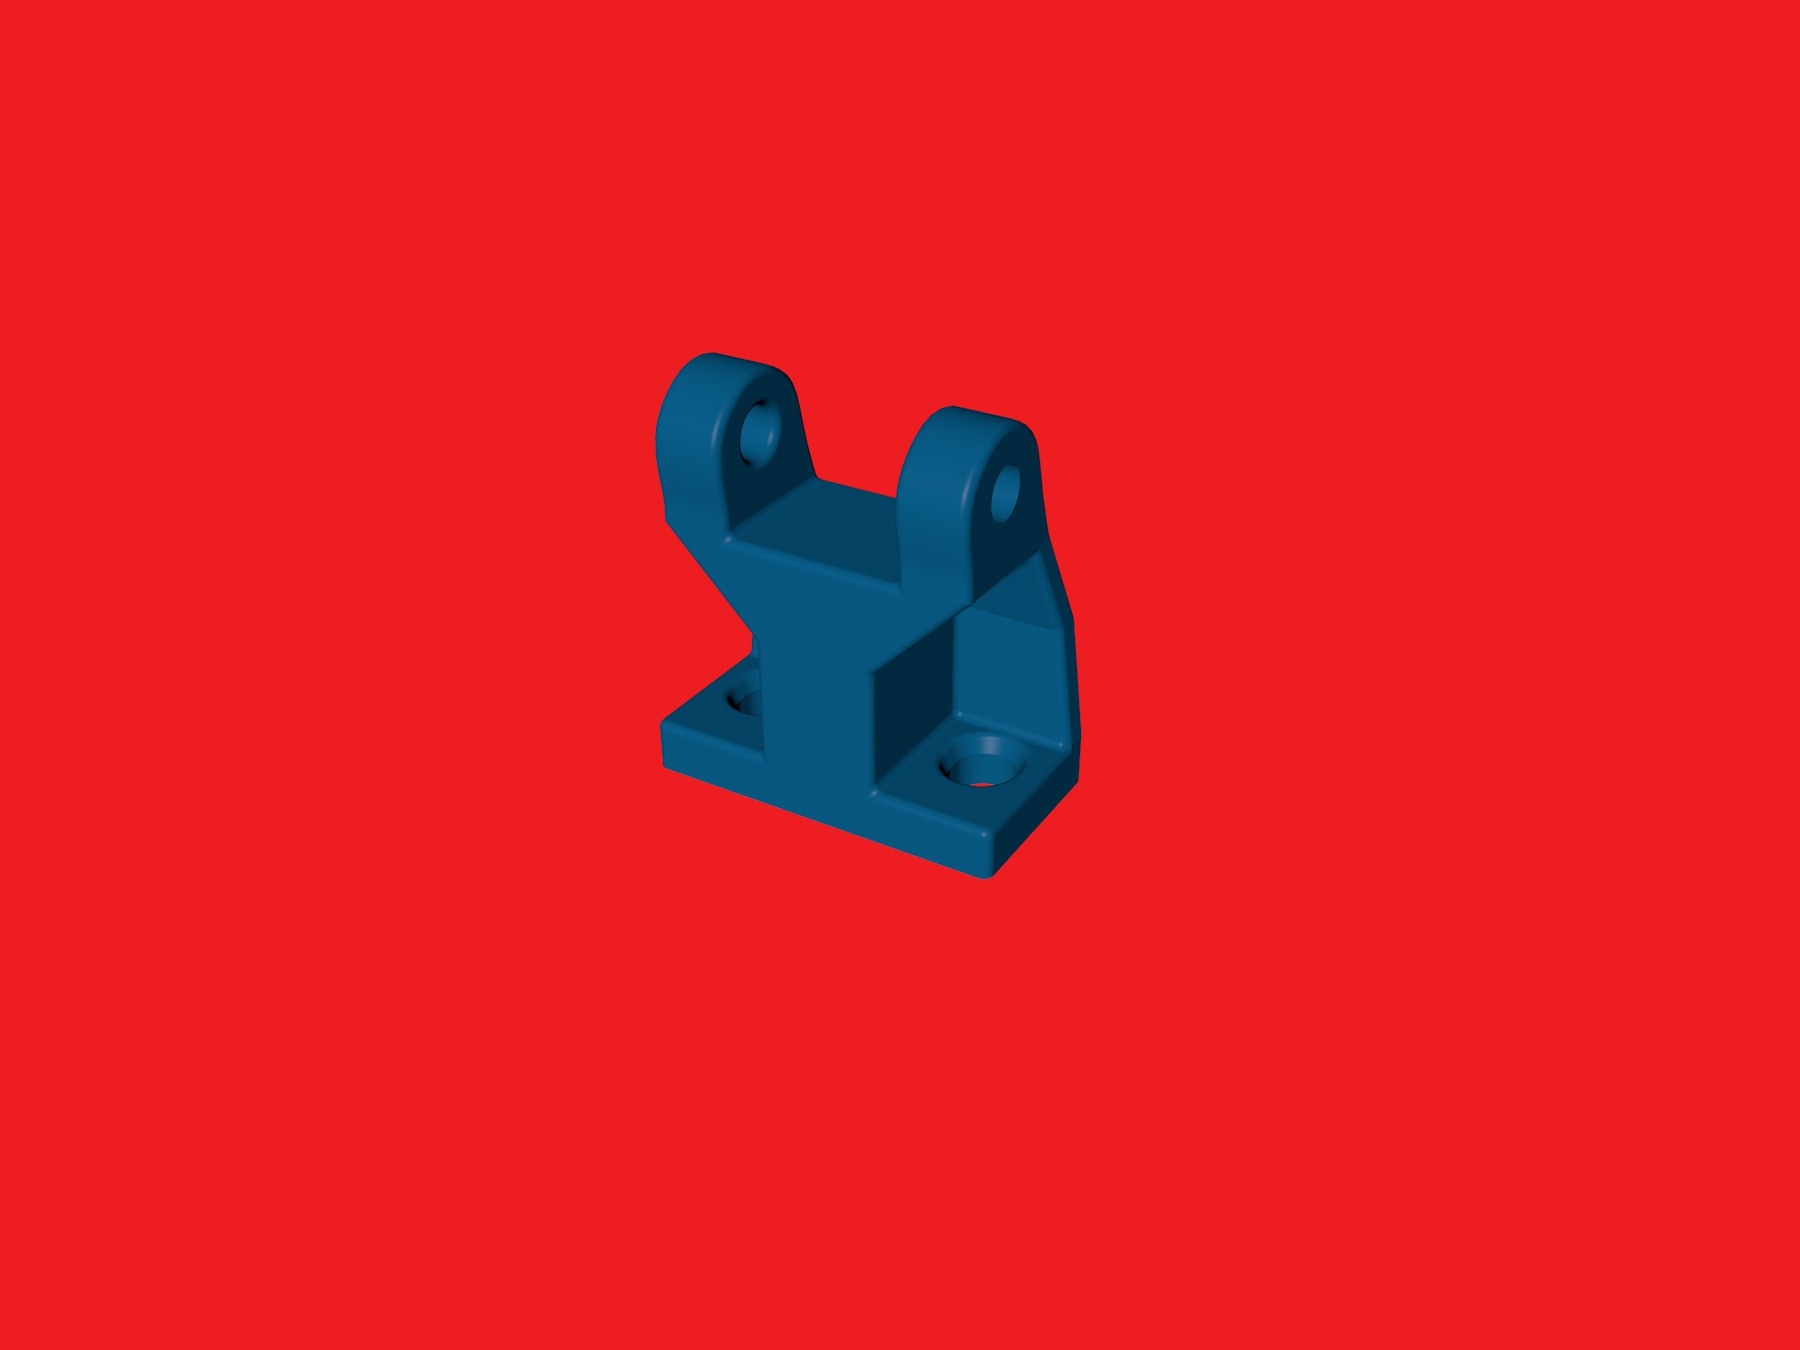 tamiya wrenchdog dyna storm dyna blaster tr-15t d4 gearbox link